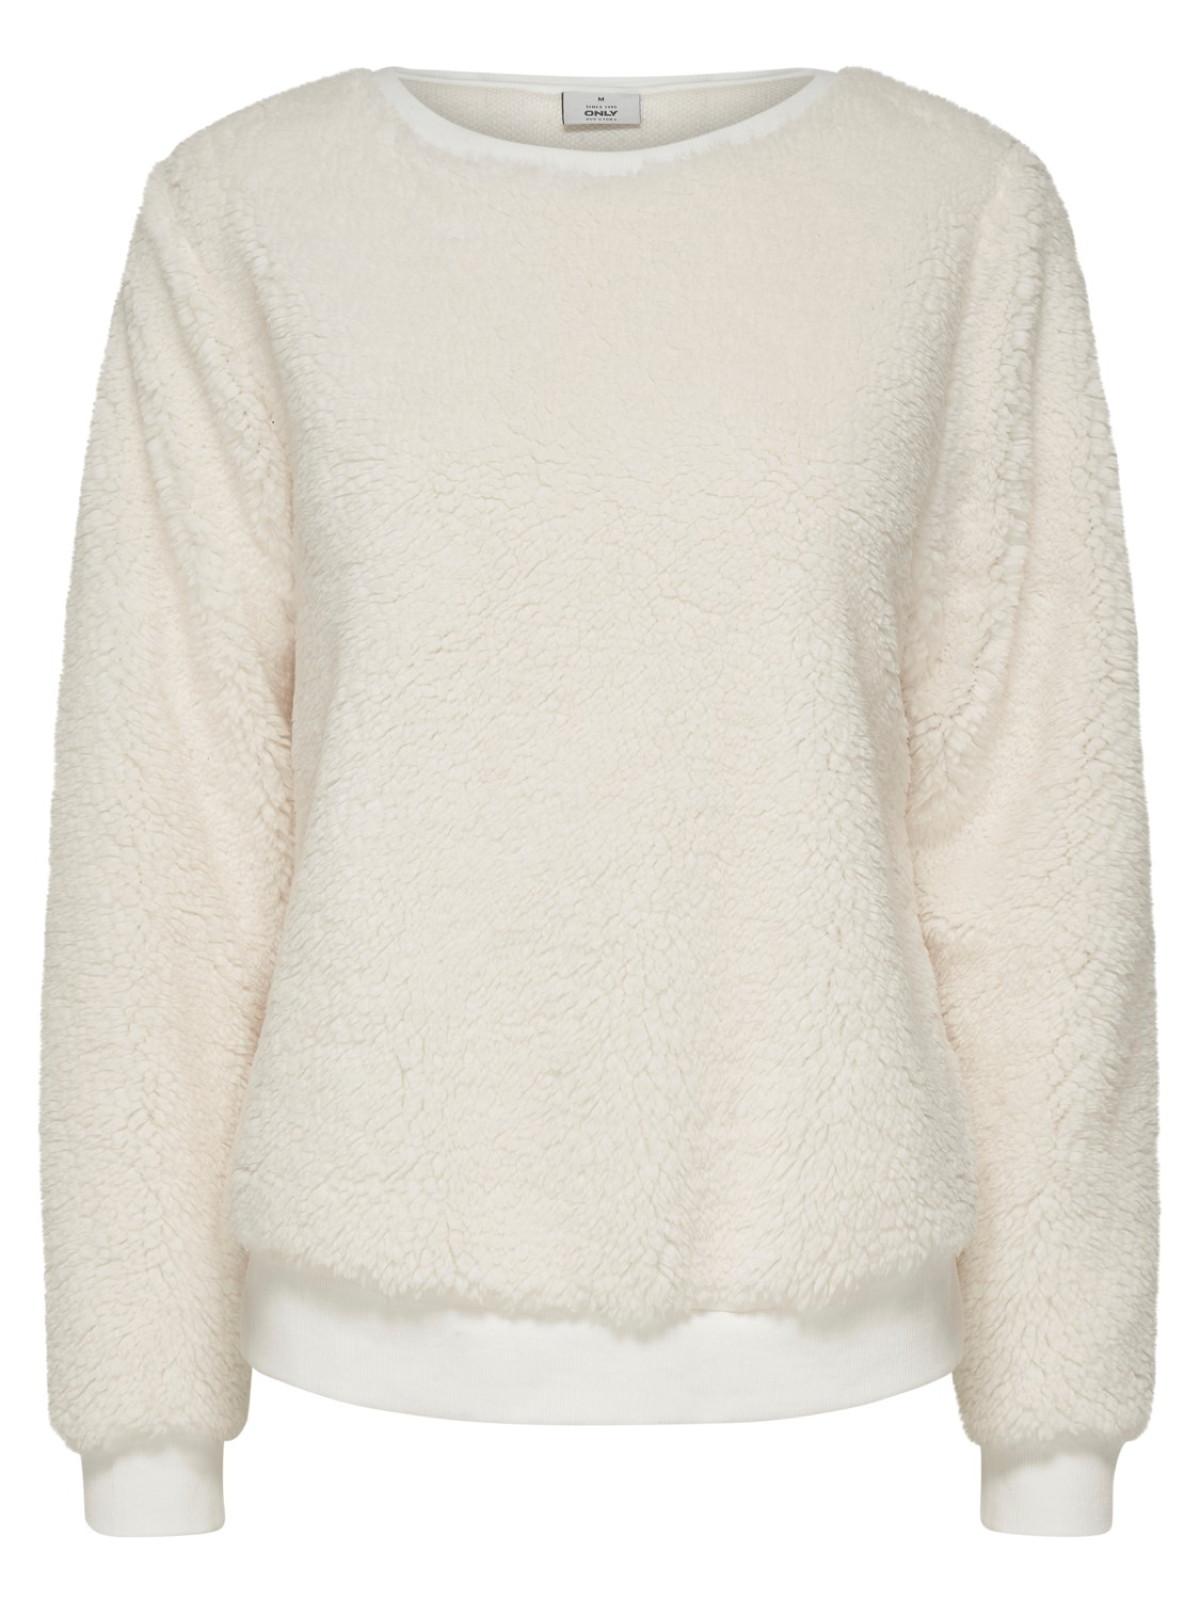 e86d38f3dafb53 Only Damen Sweater ELLIE Langarm Teddyfell Pullover Damen Pullover